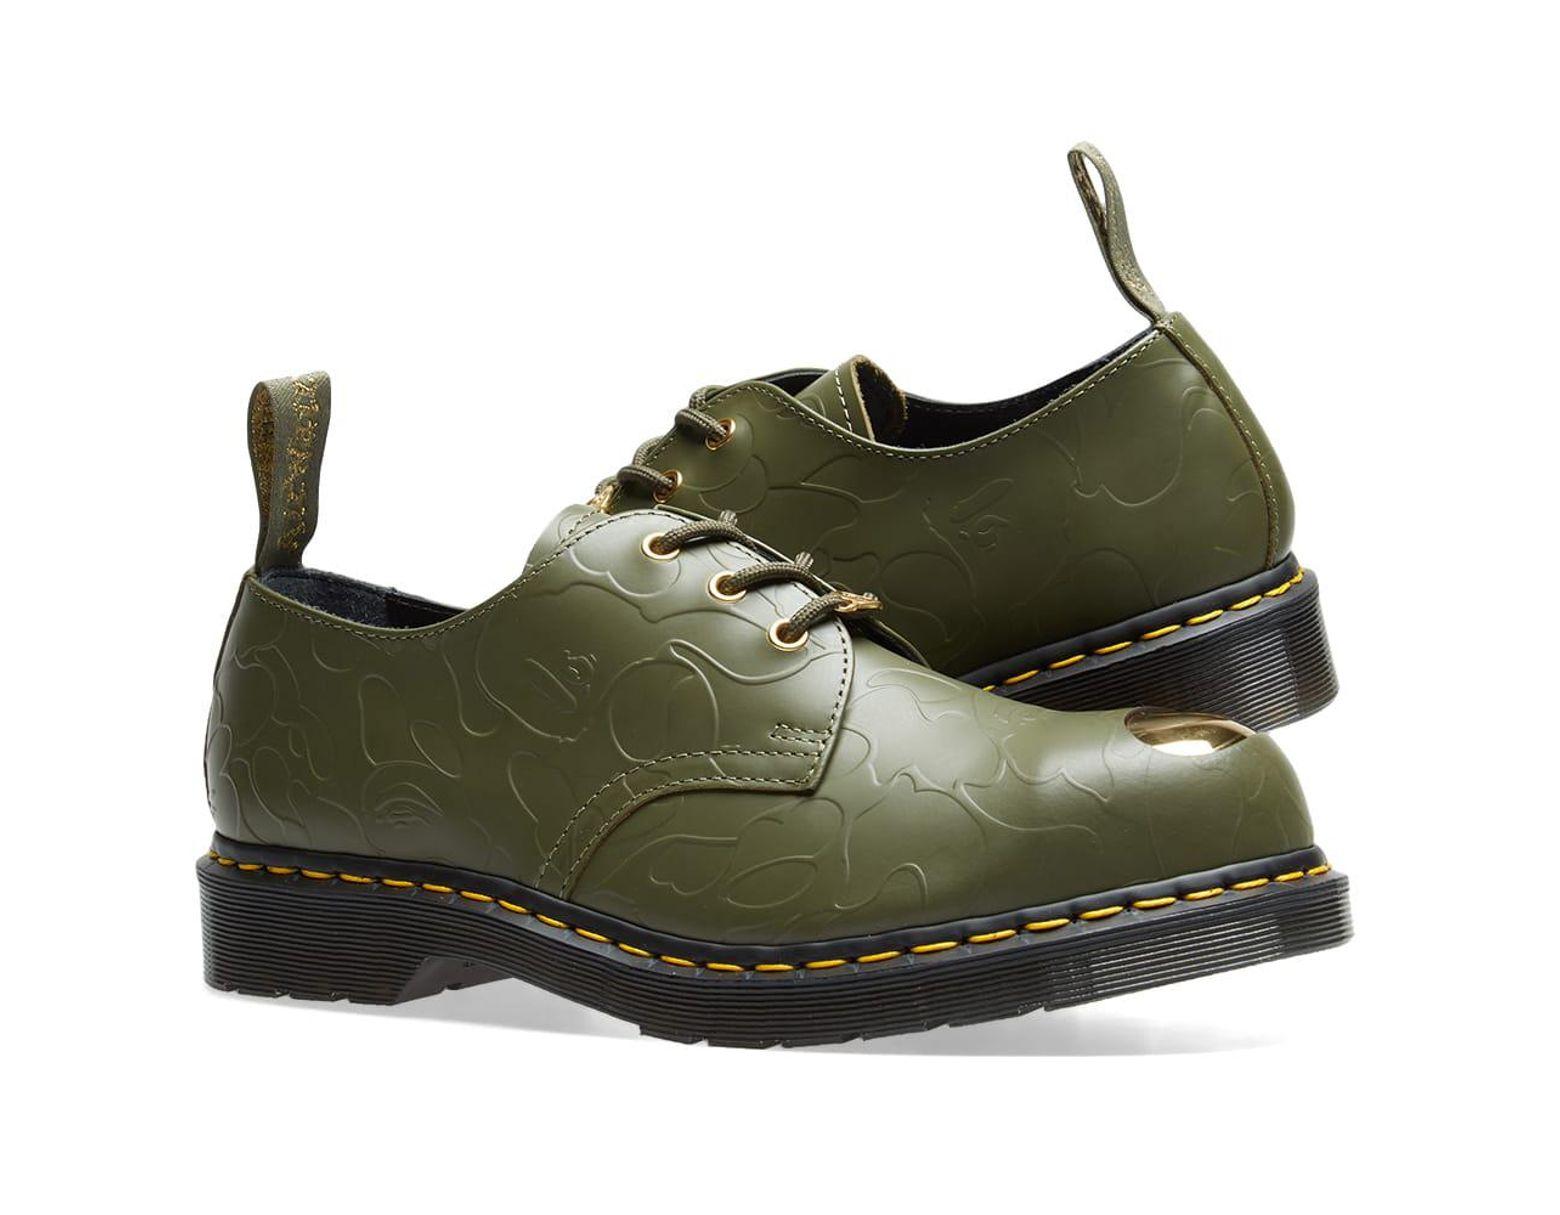 0b92ca74bb Dr. Martens Dr. Martens X Bape Petri Shoe in Green for Men - Lyst